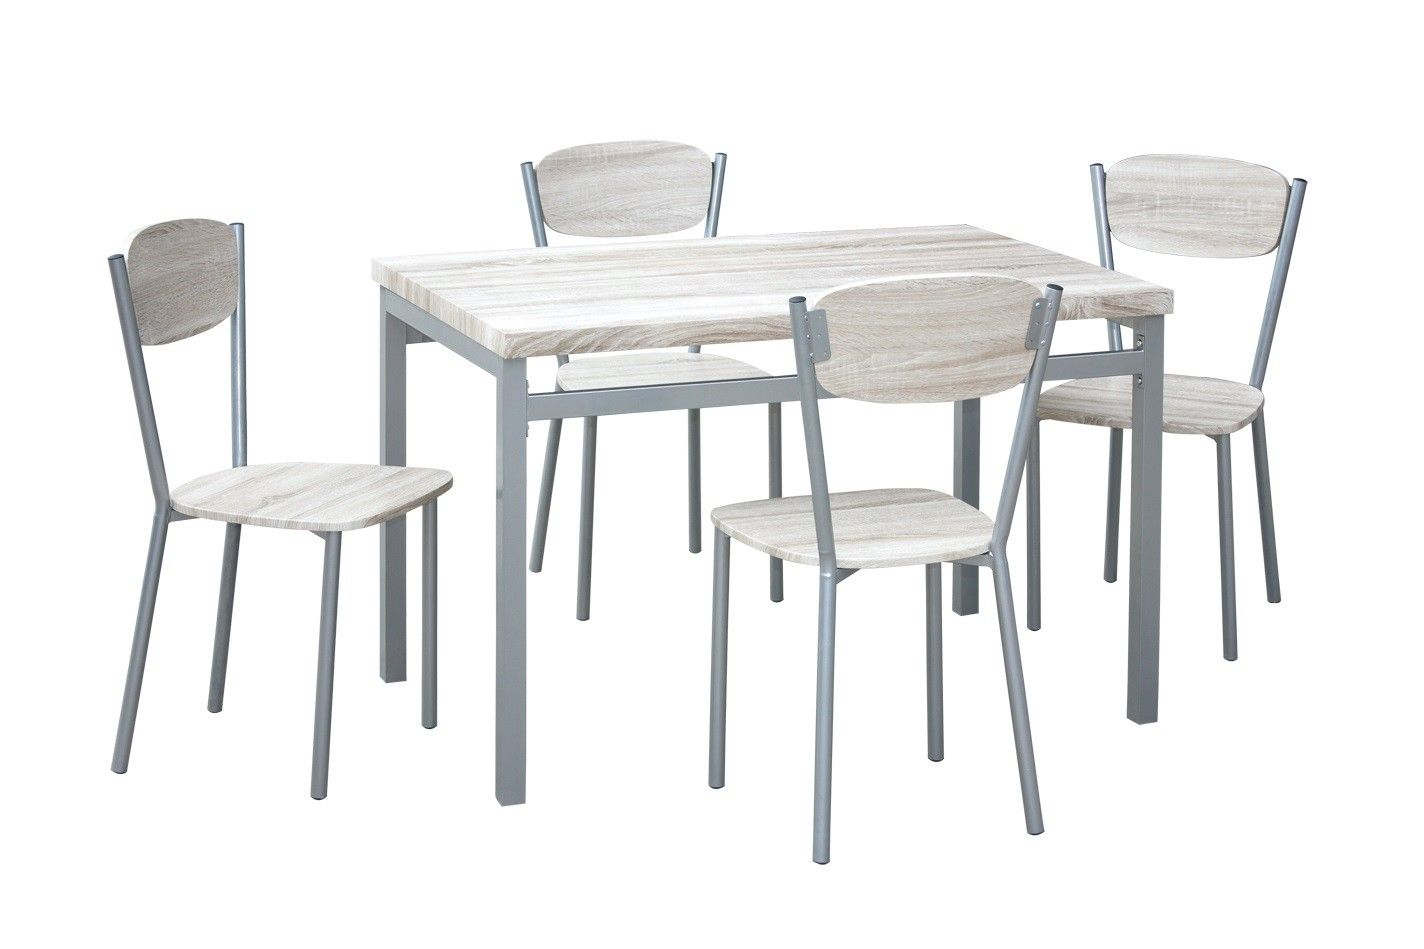 Chaise pas chere finest full size of chaise pas cher - Chaise cuisine pas chere ...